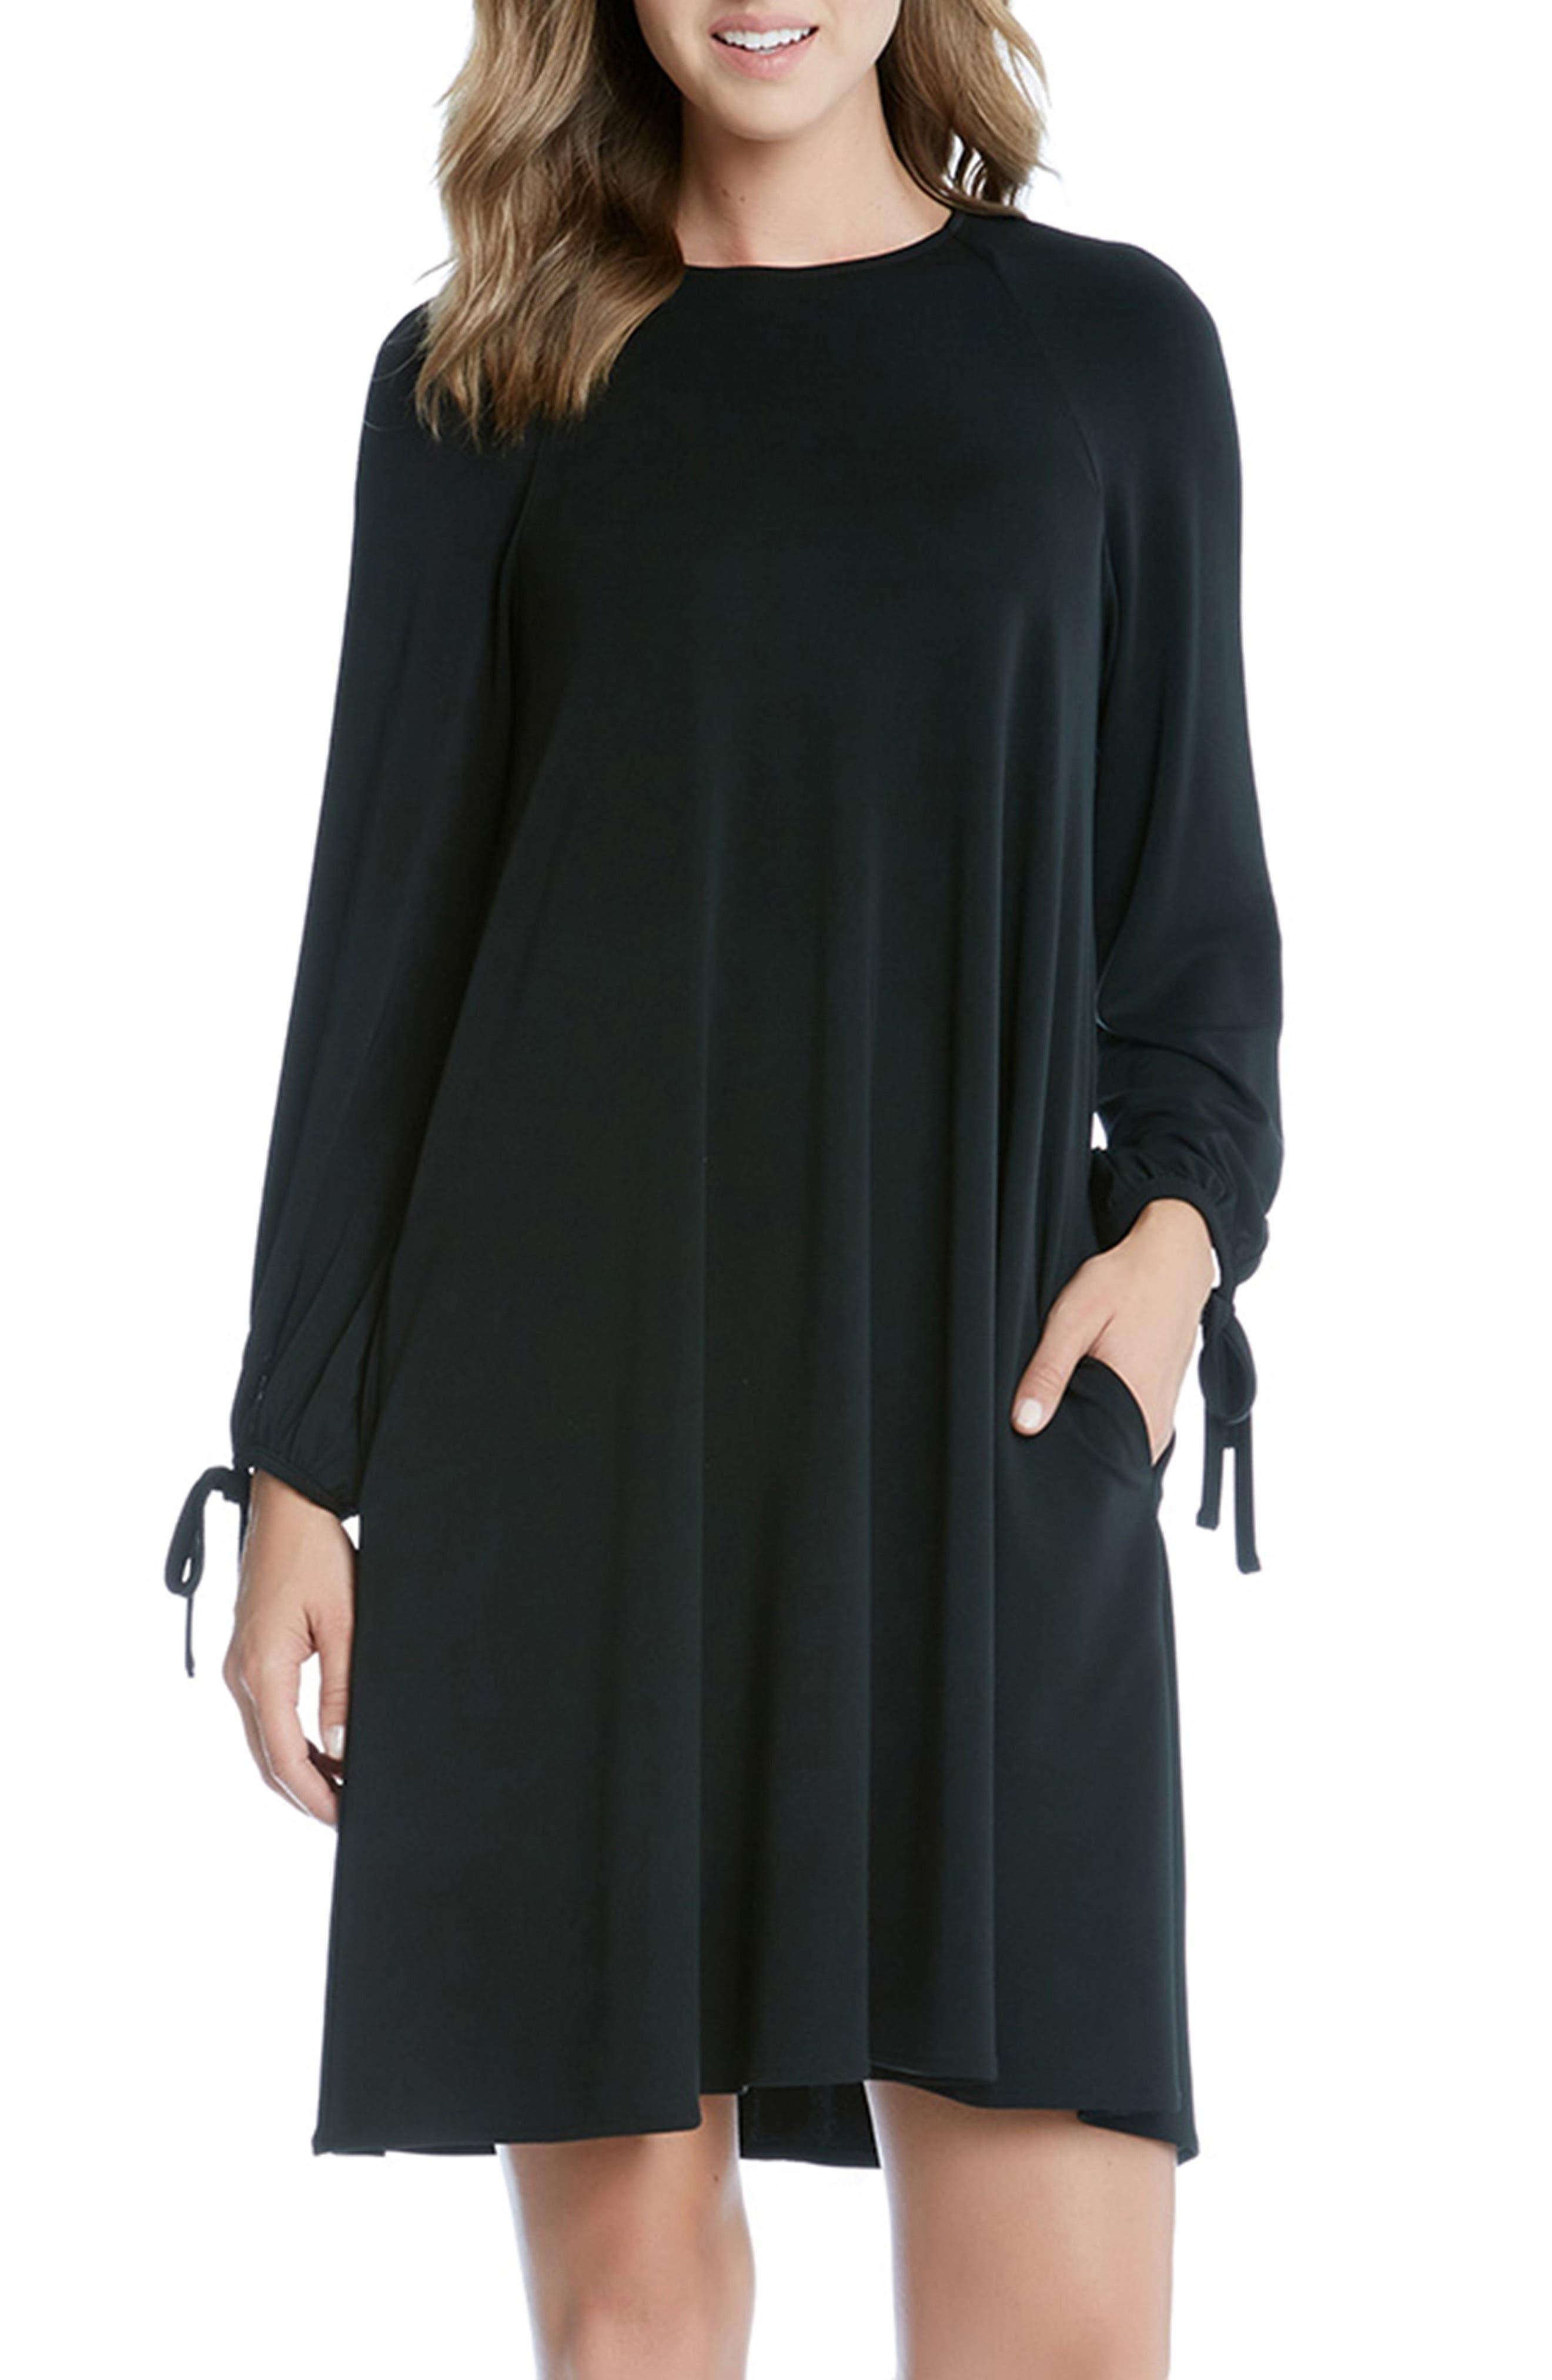 Alternate Image 1 Selected - Karen Kane Tie Sleeve Swing Dress